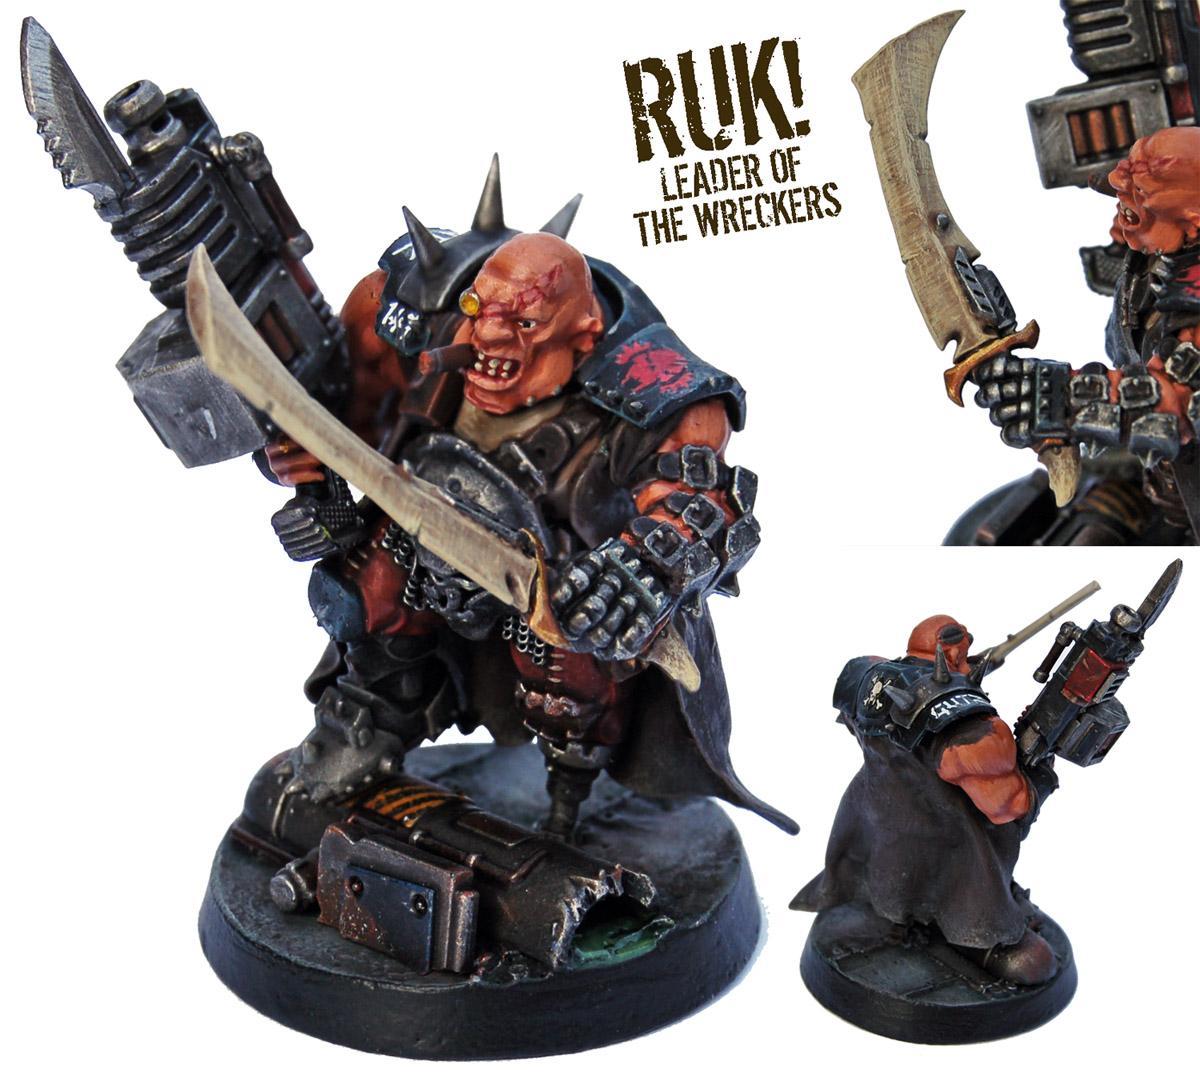 Astra Militarum, Bullgryn, Bullgryns, Conversion, Hired Guns, Kill Team, Necromunda, Nork Deddog, Ogres, Ogryn Bodyguard, Ogryns, Warhammer 40,000